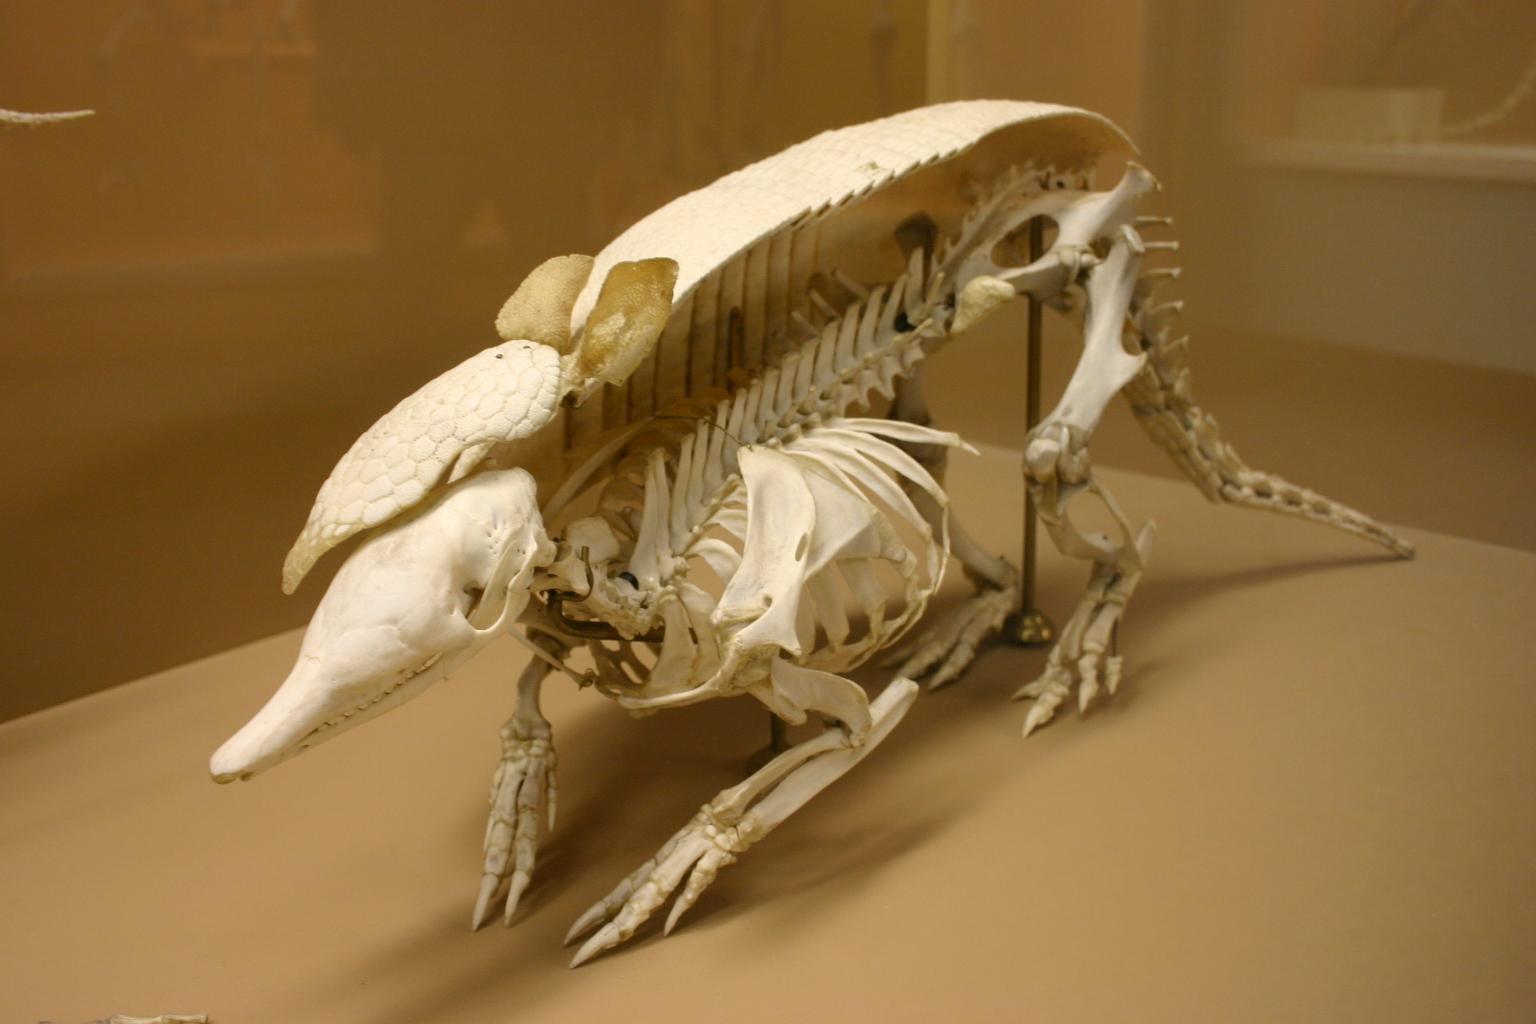 Description nine banded armadillo skeleton